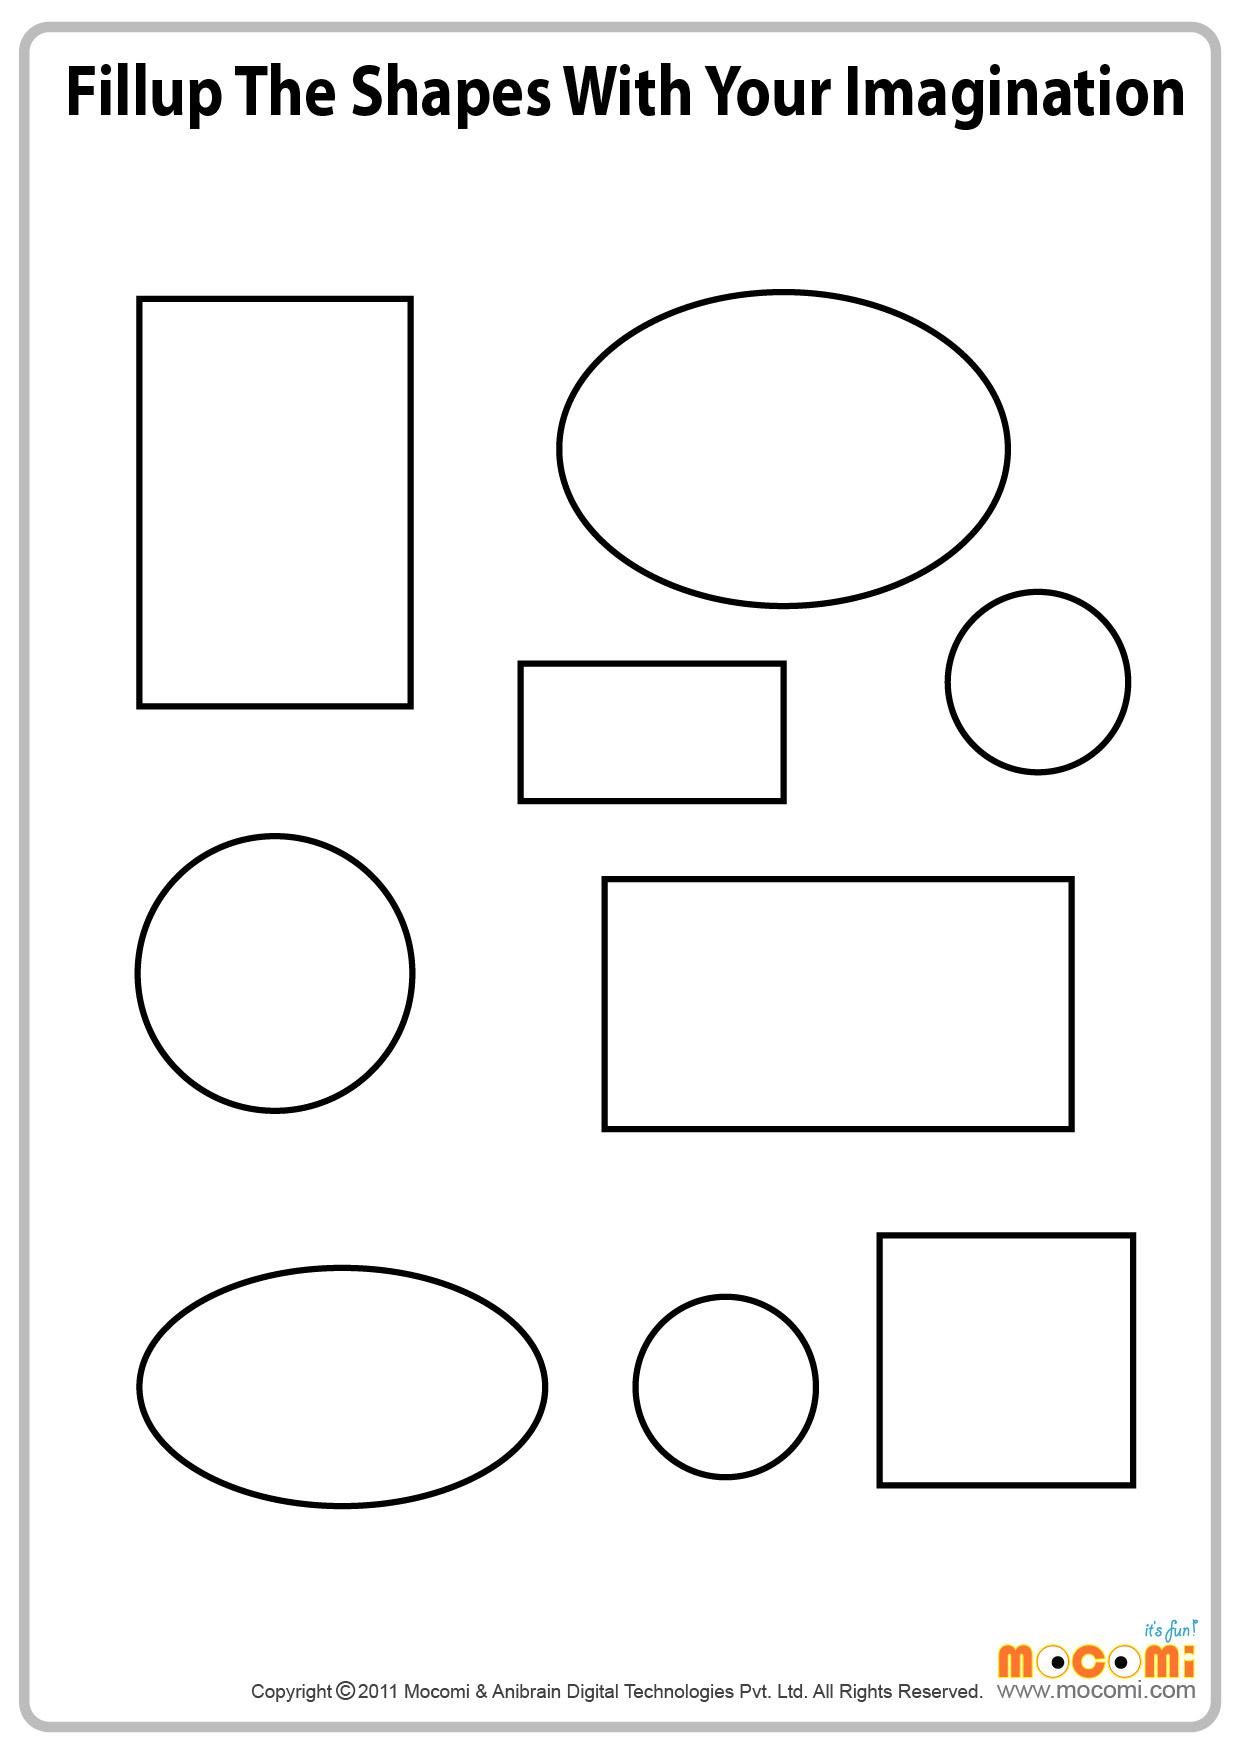 Imagining shapes (II)